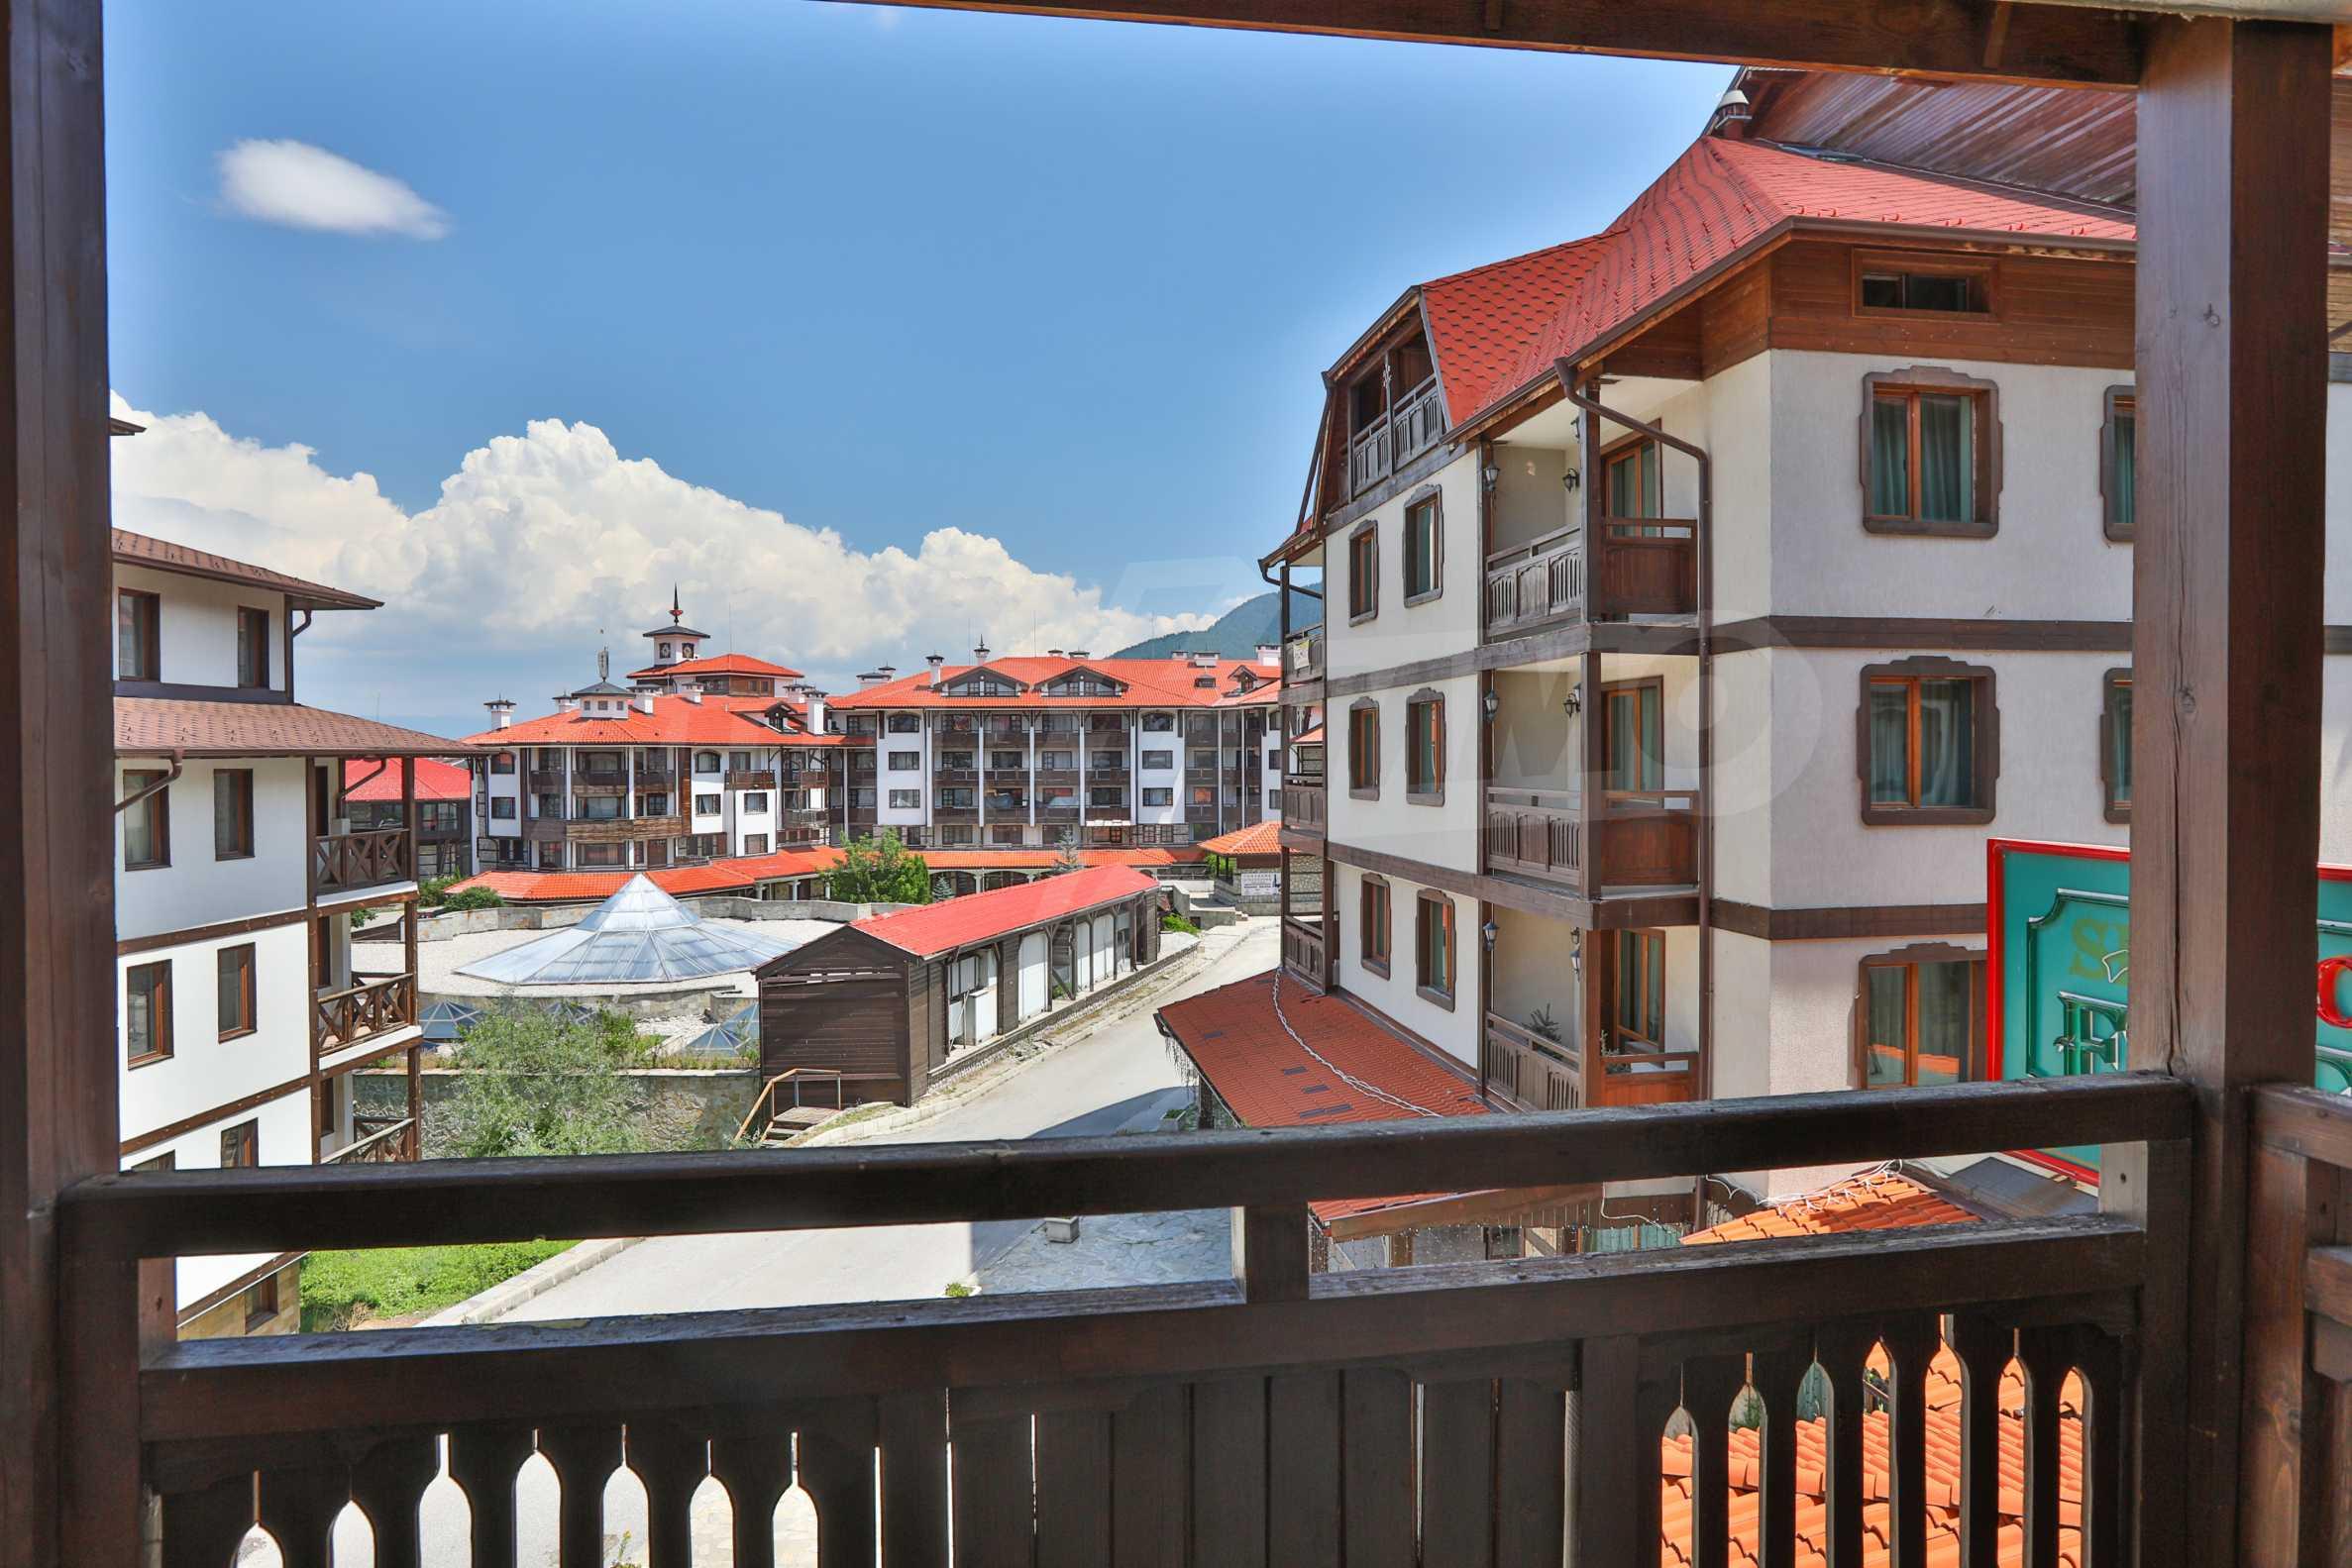 Просторен тристаен апартамент, намиращ се в комплекс Емералд в Банско 6